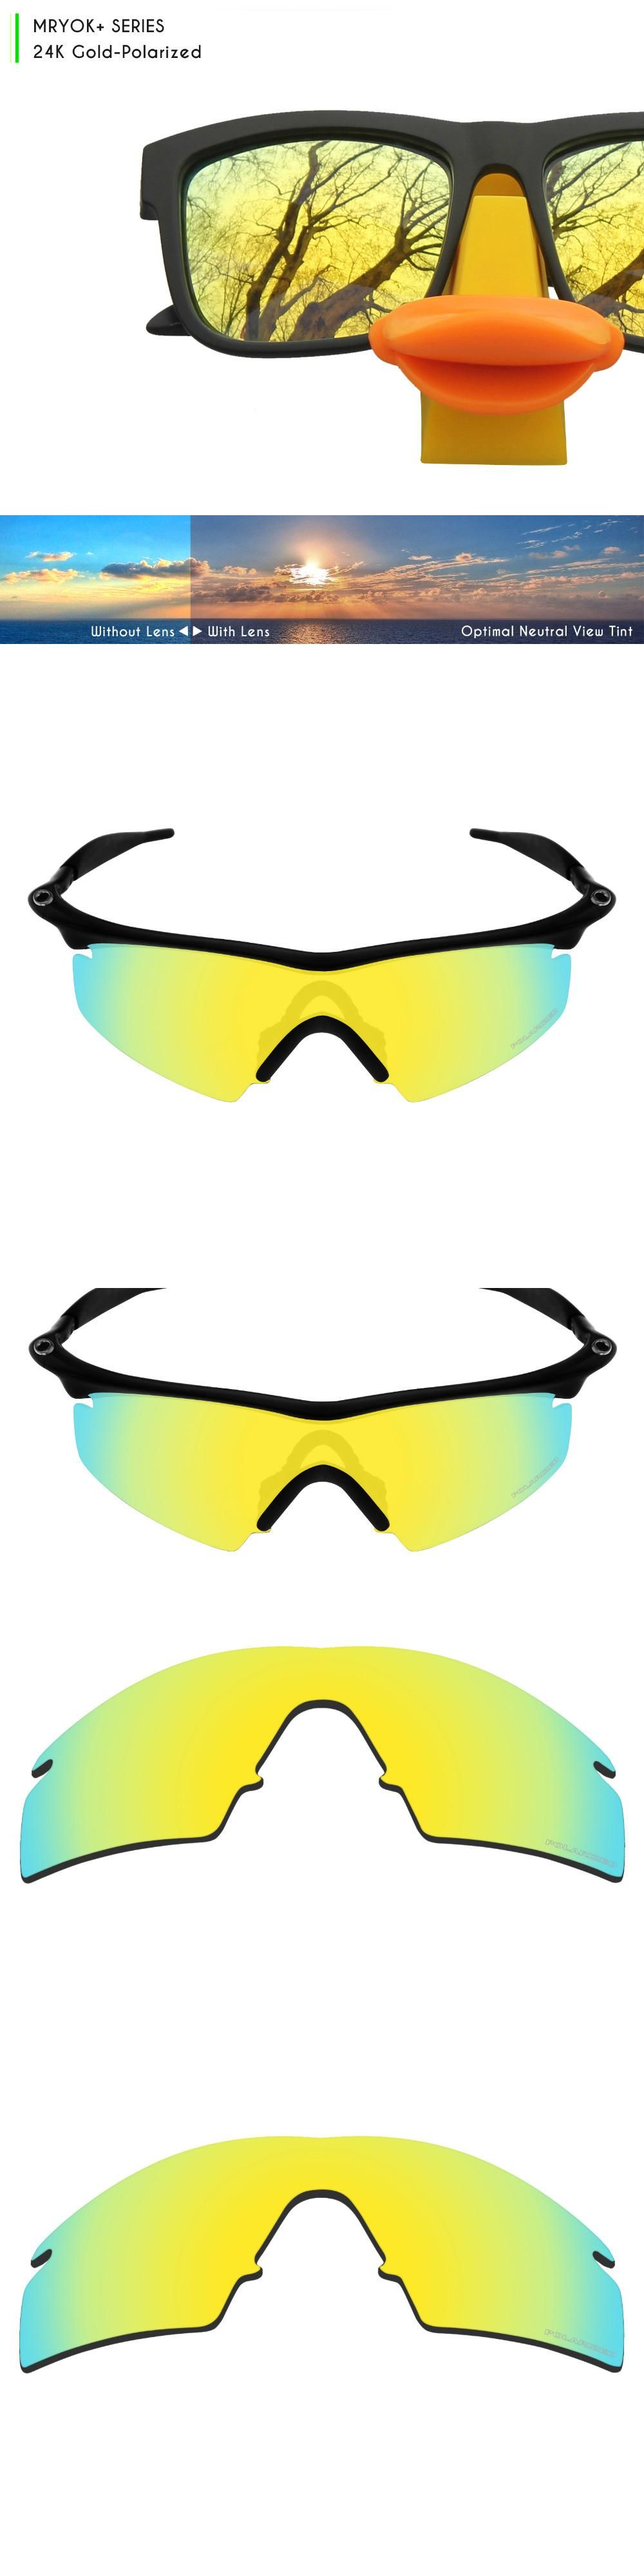 4b48f47da81 Mryok+ POLARIZED Resist SeaWater Replacement Lenses for Oakley M Frame  Strike Sunglasses 24K Gold